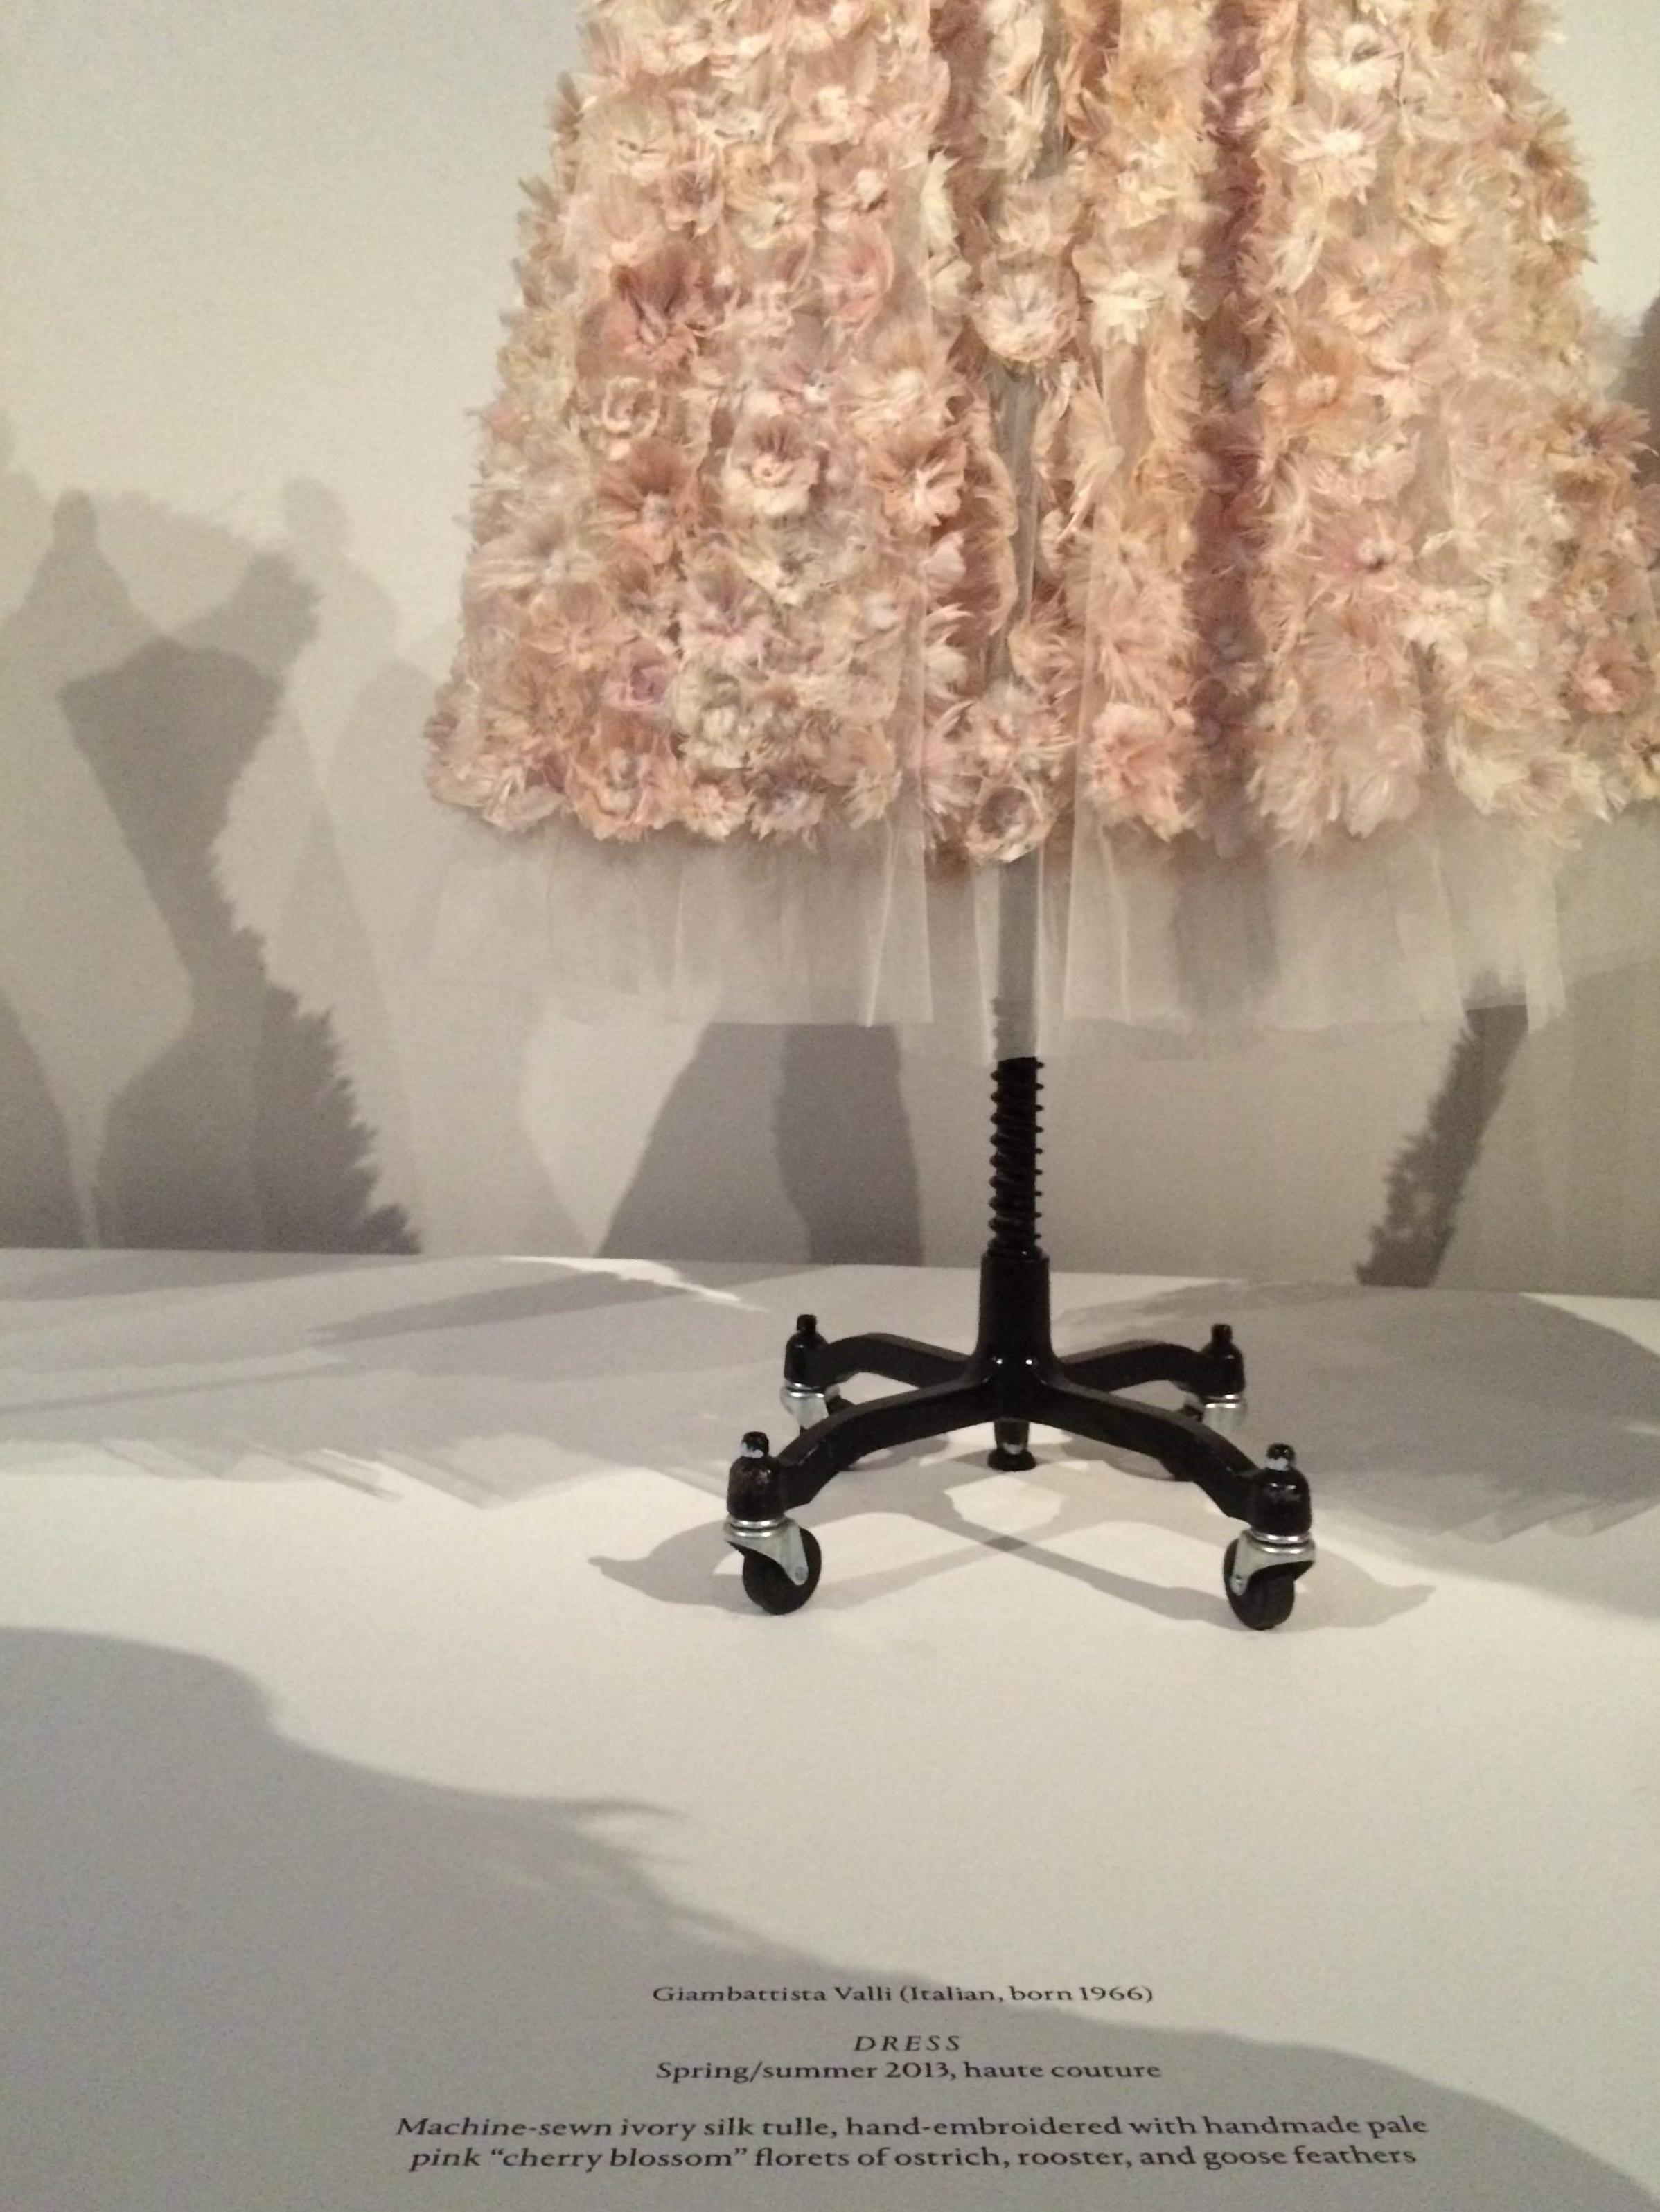 Giambattista Valli SS'13 Haute Couture